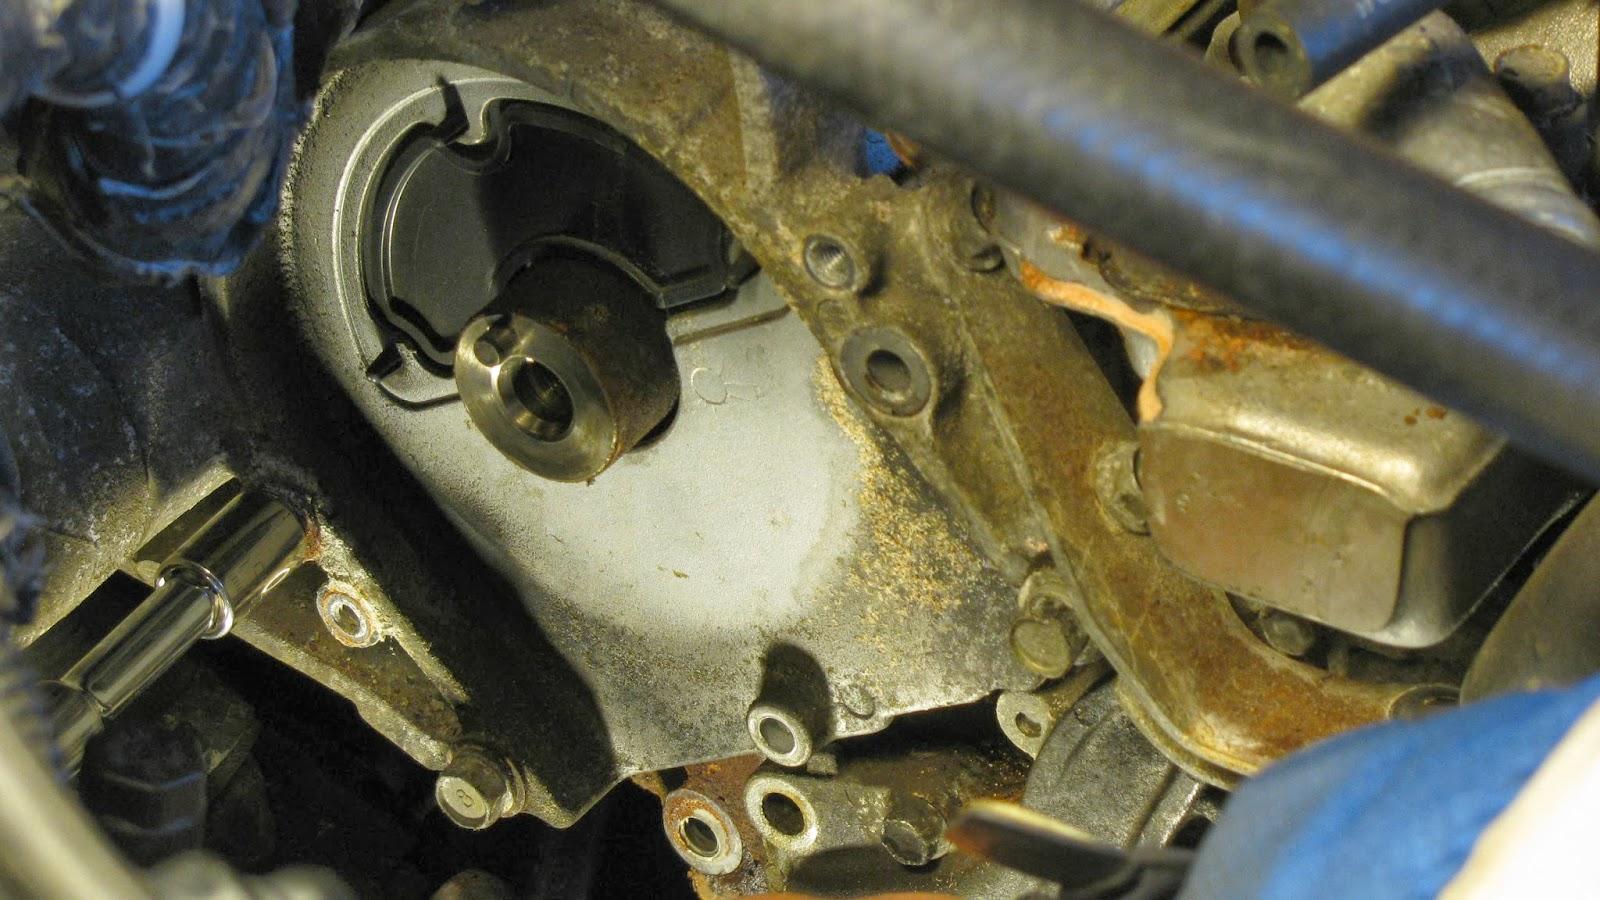 The Original Mechanic 30 L Engine Chrysler Replace Water Pump 1995 Lebaron Timing Belt Kit Unbolting Alternator Bracket